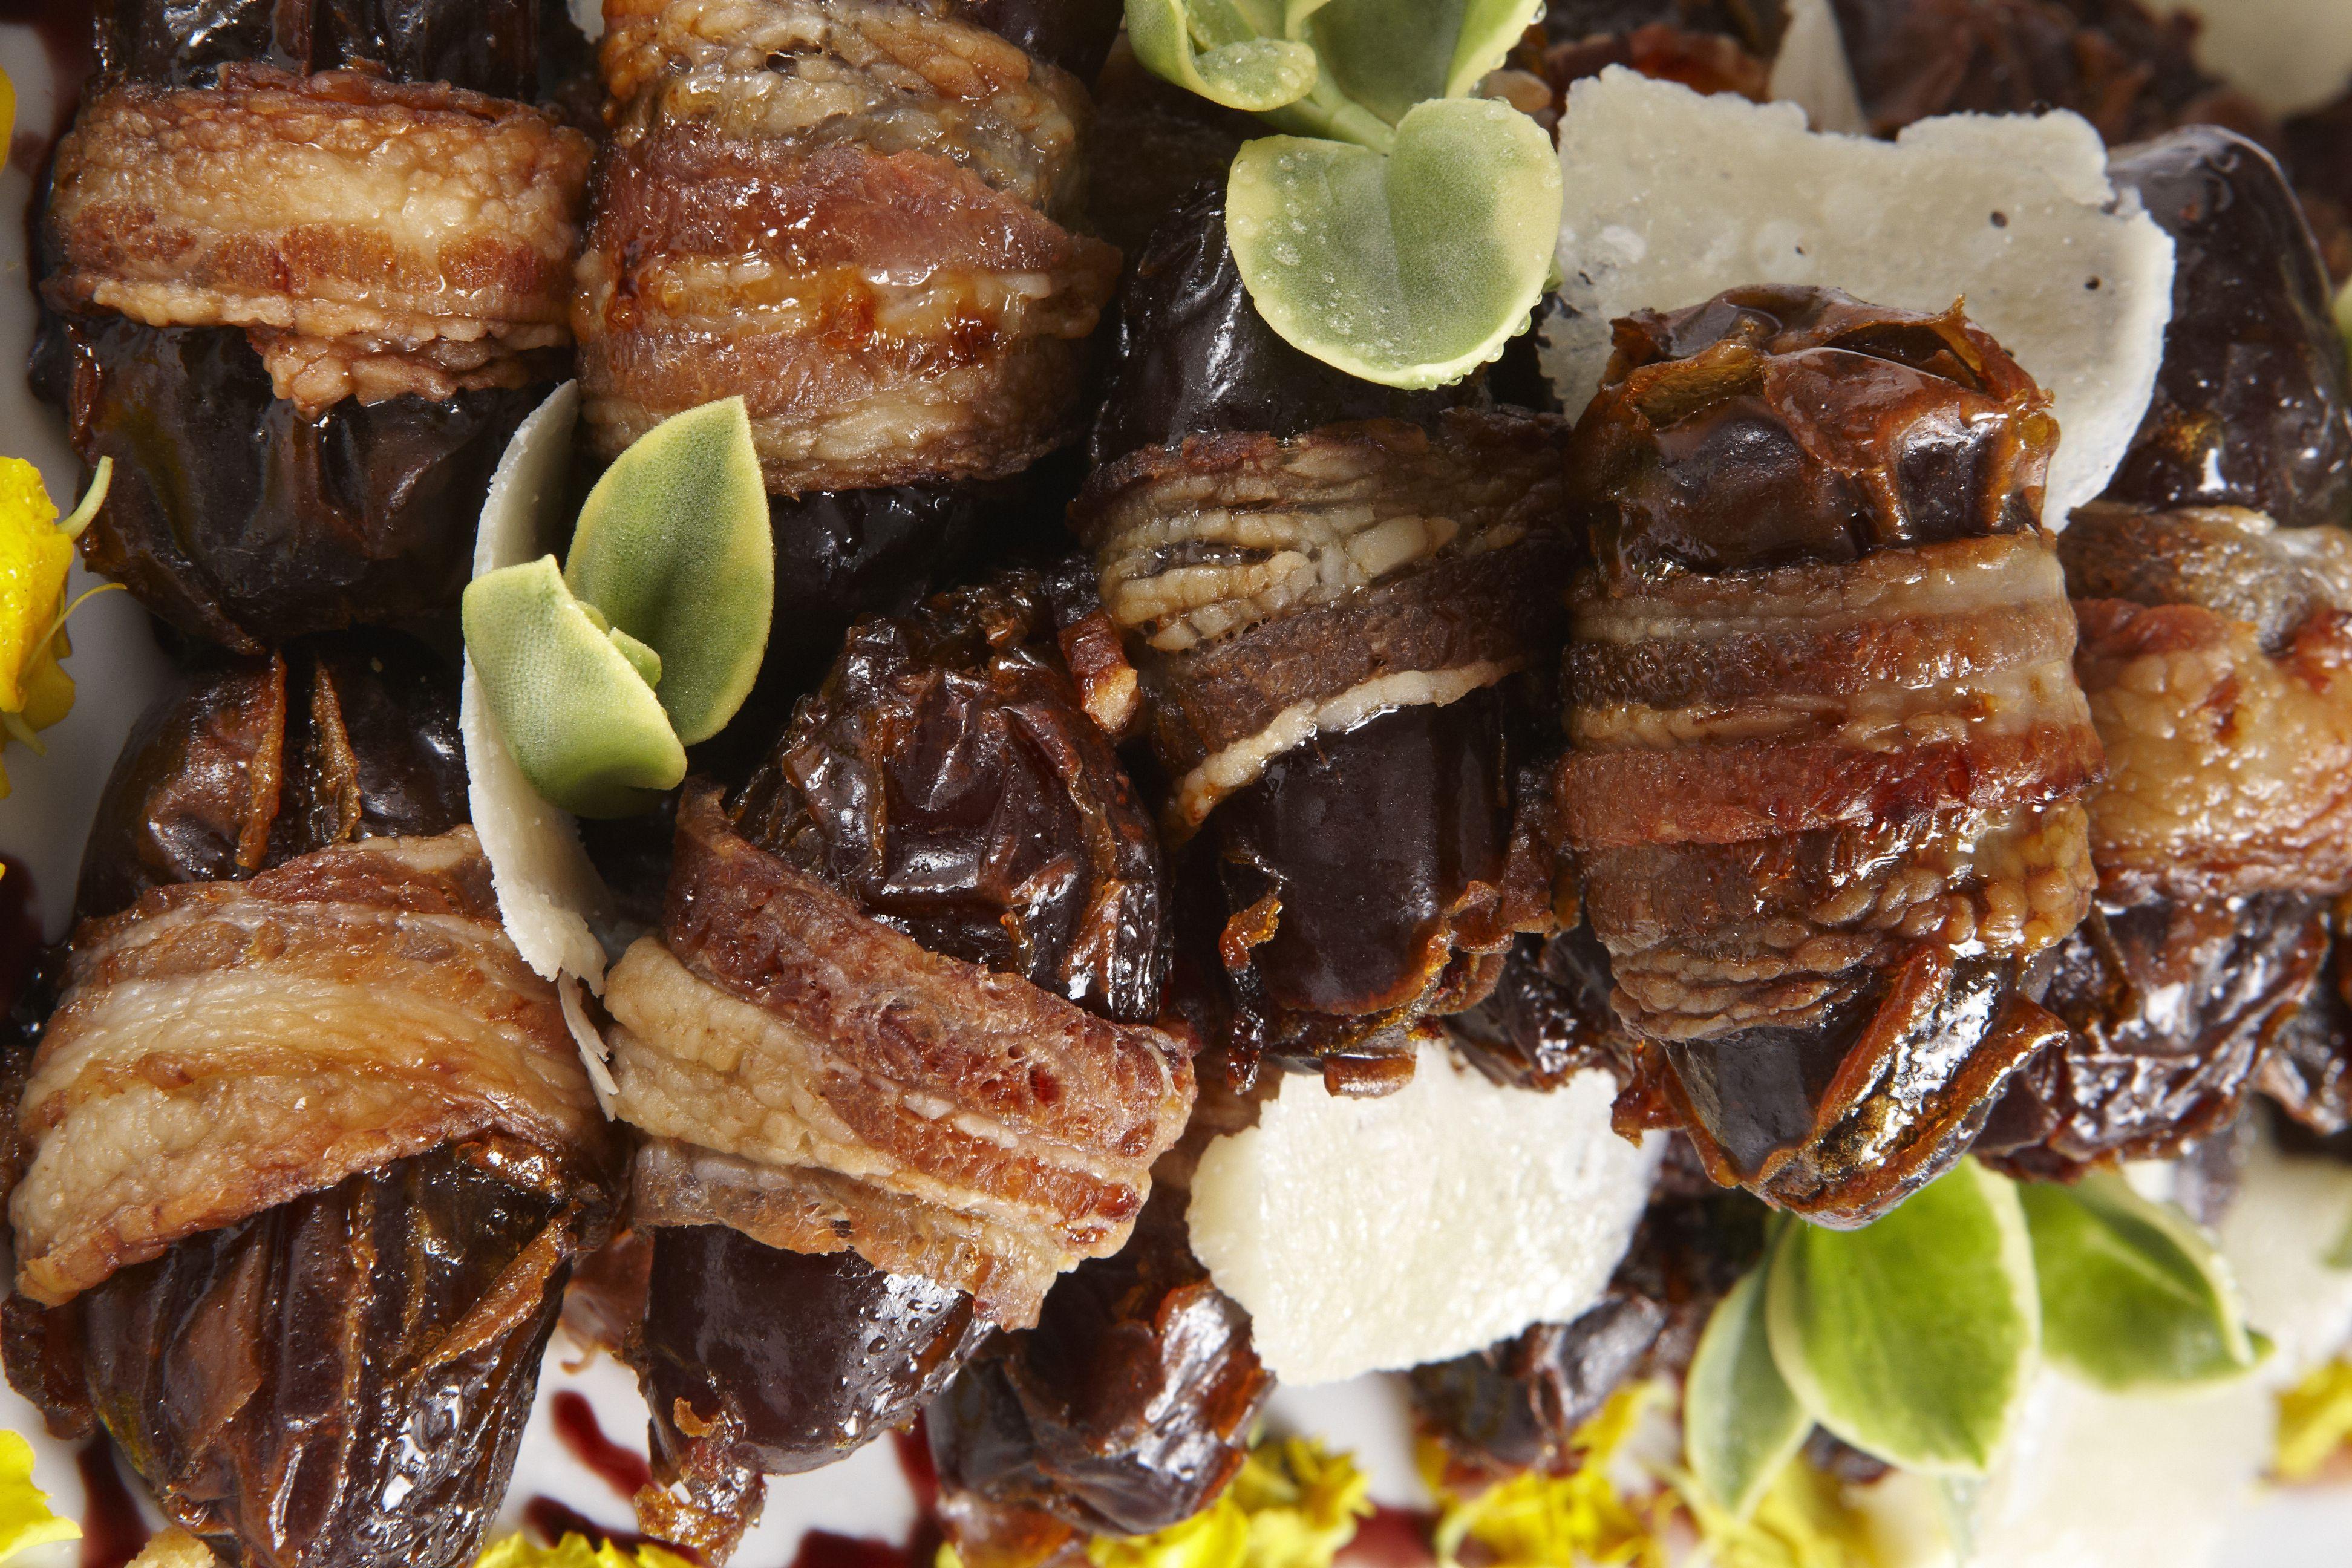 Bacon dates in Australia